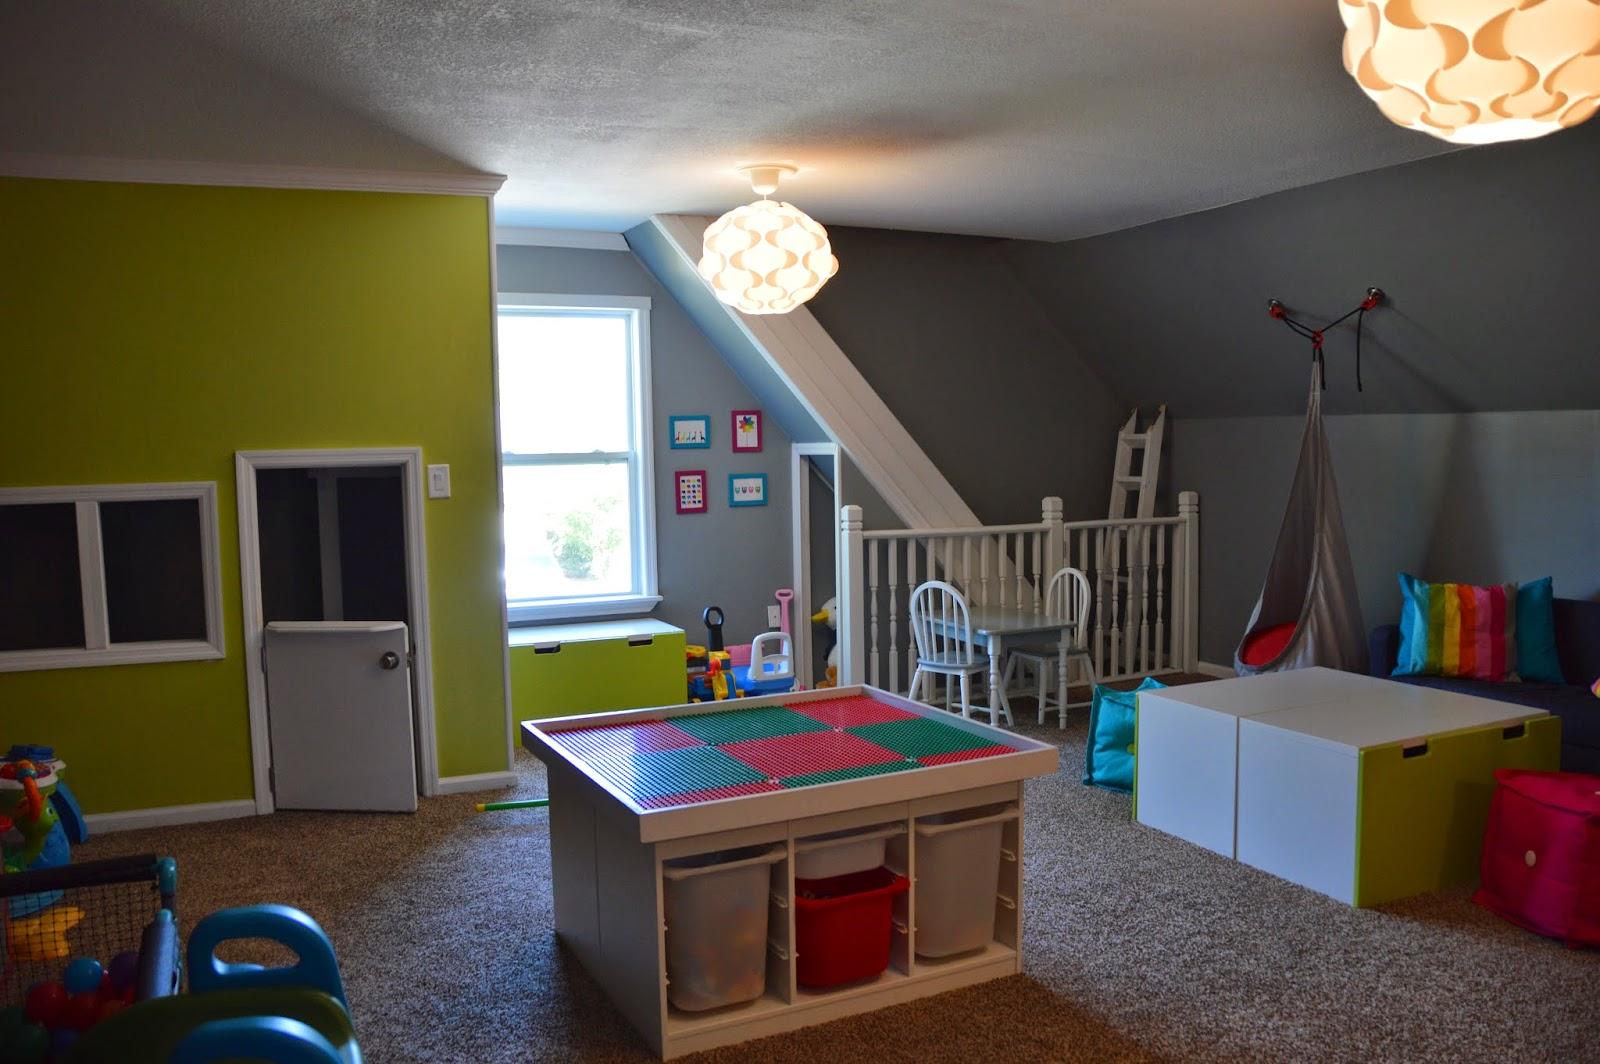 gyerekszoba ikea kallax s stuva. Black Bedroom Furniture Sets. Home Design Ideas